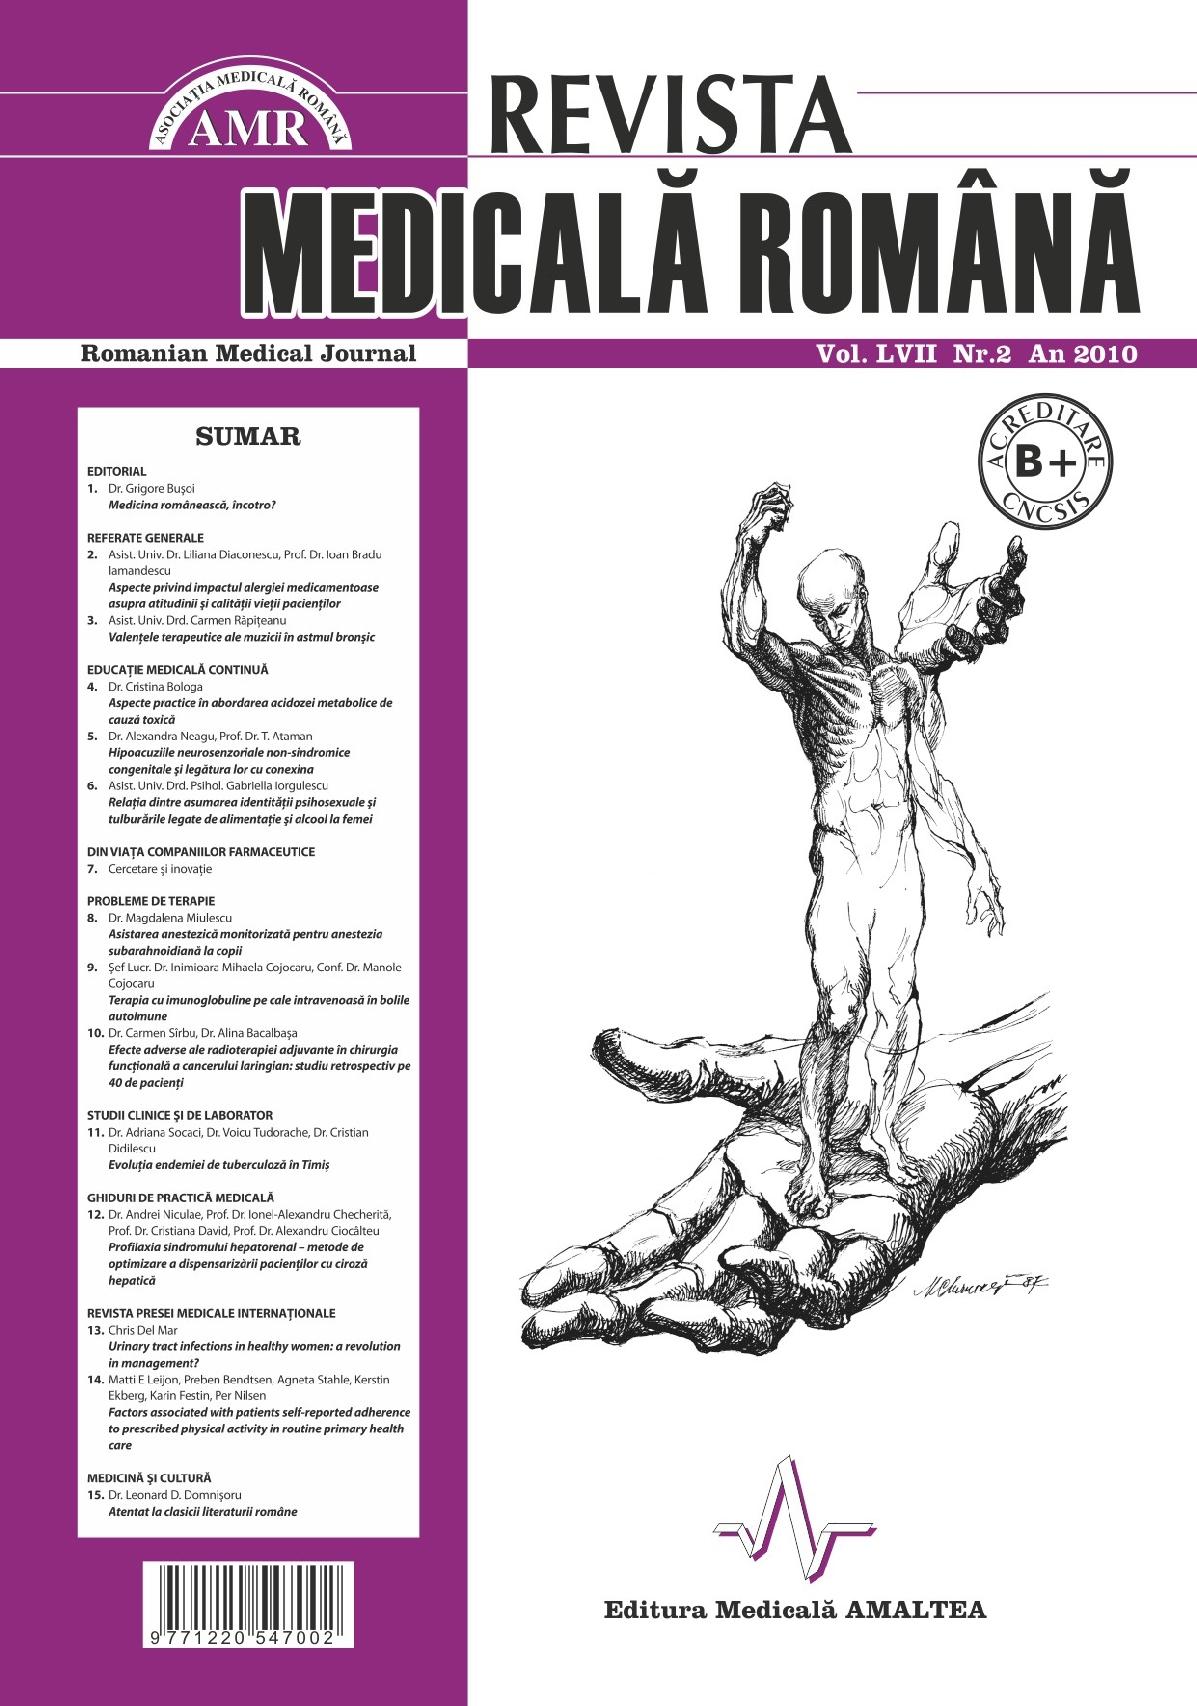 REVISTA MEDICALA ROMANA - Romanian Medical Journal, Vol. LVII, Nr. 2, An 2010